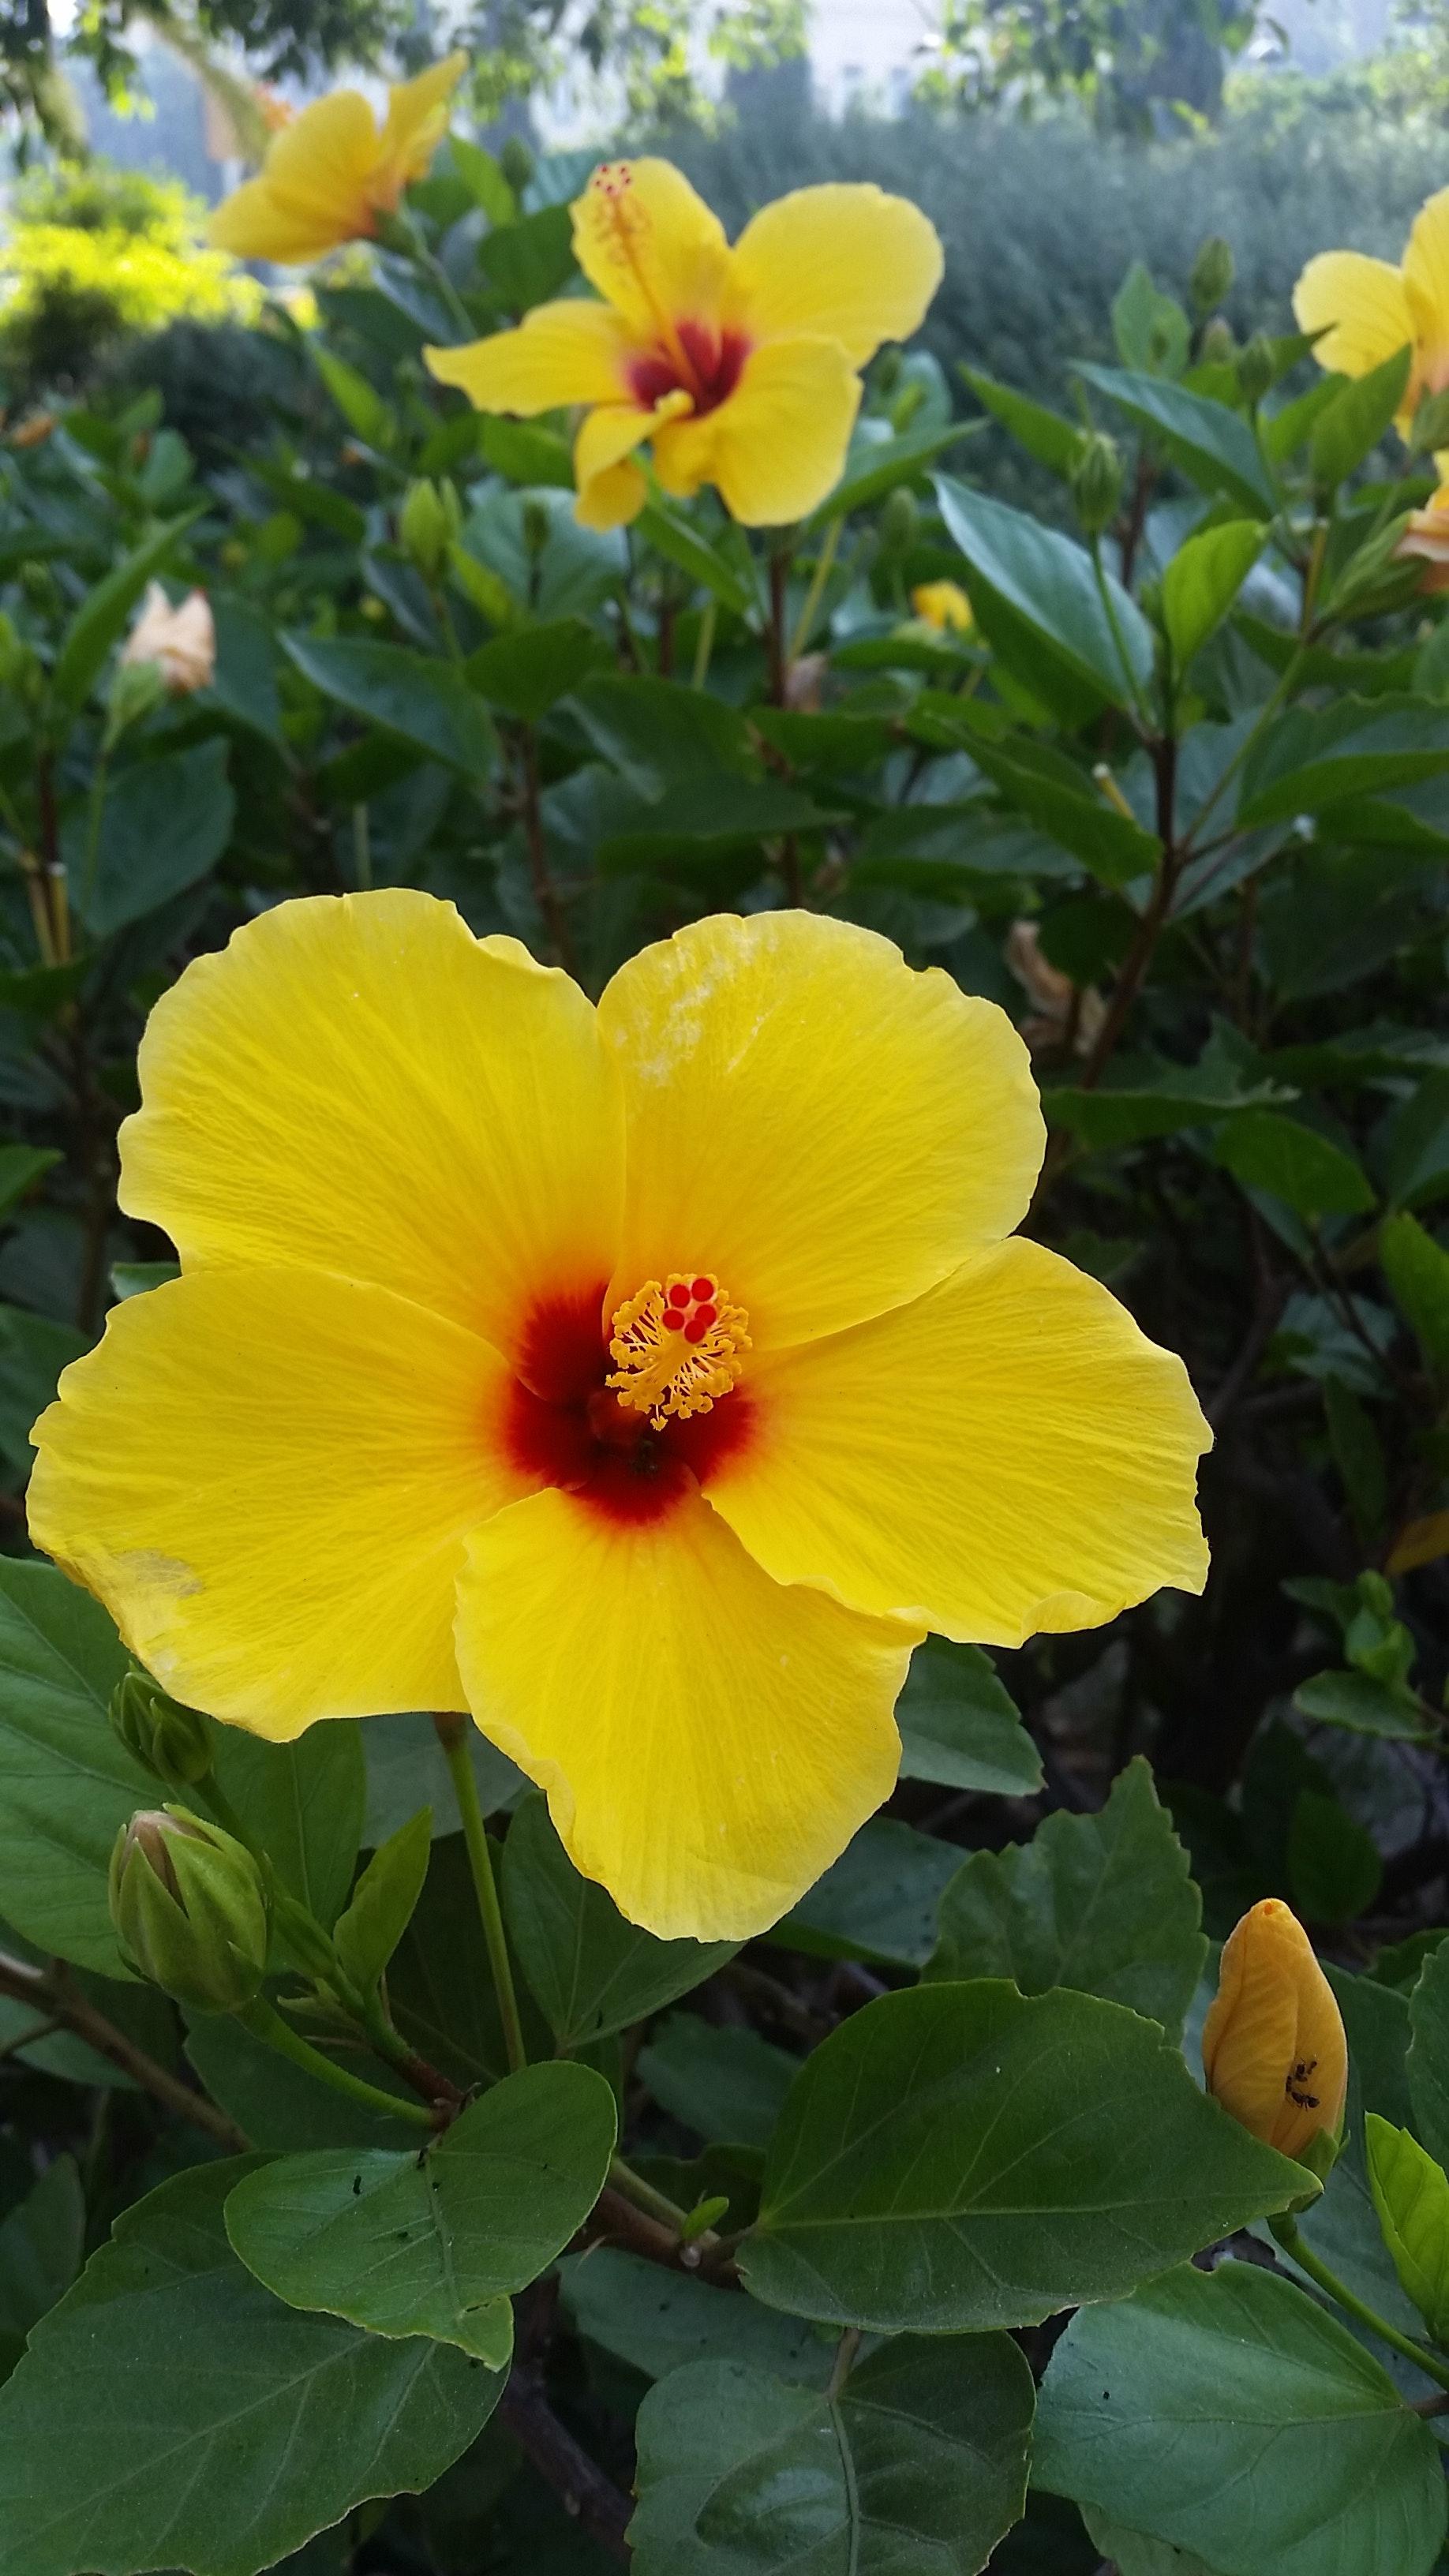 Free stock photo of beautiful flowers beauty flower free download izmirmasajfo